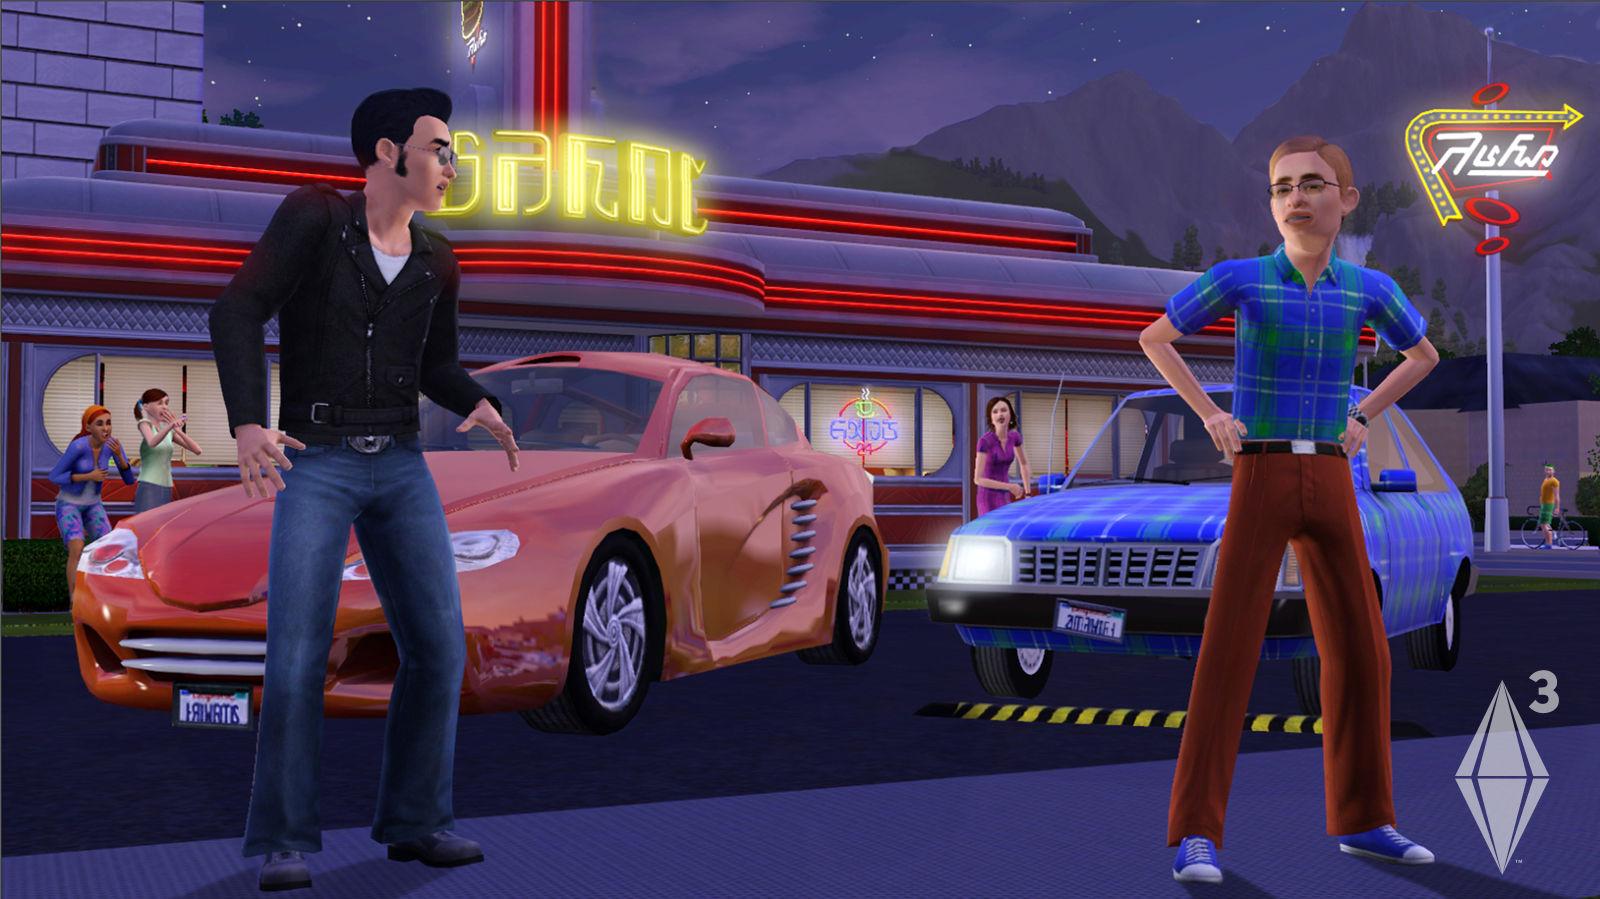 Buy The Sims 3 Pc Game Origin Download